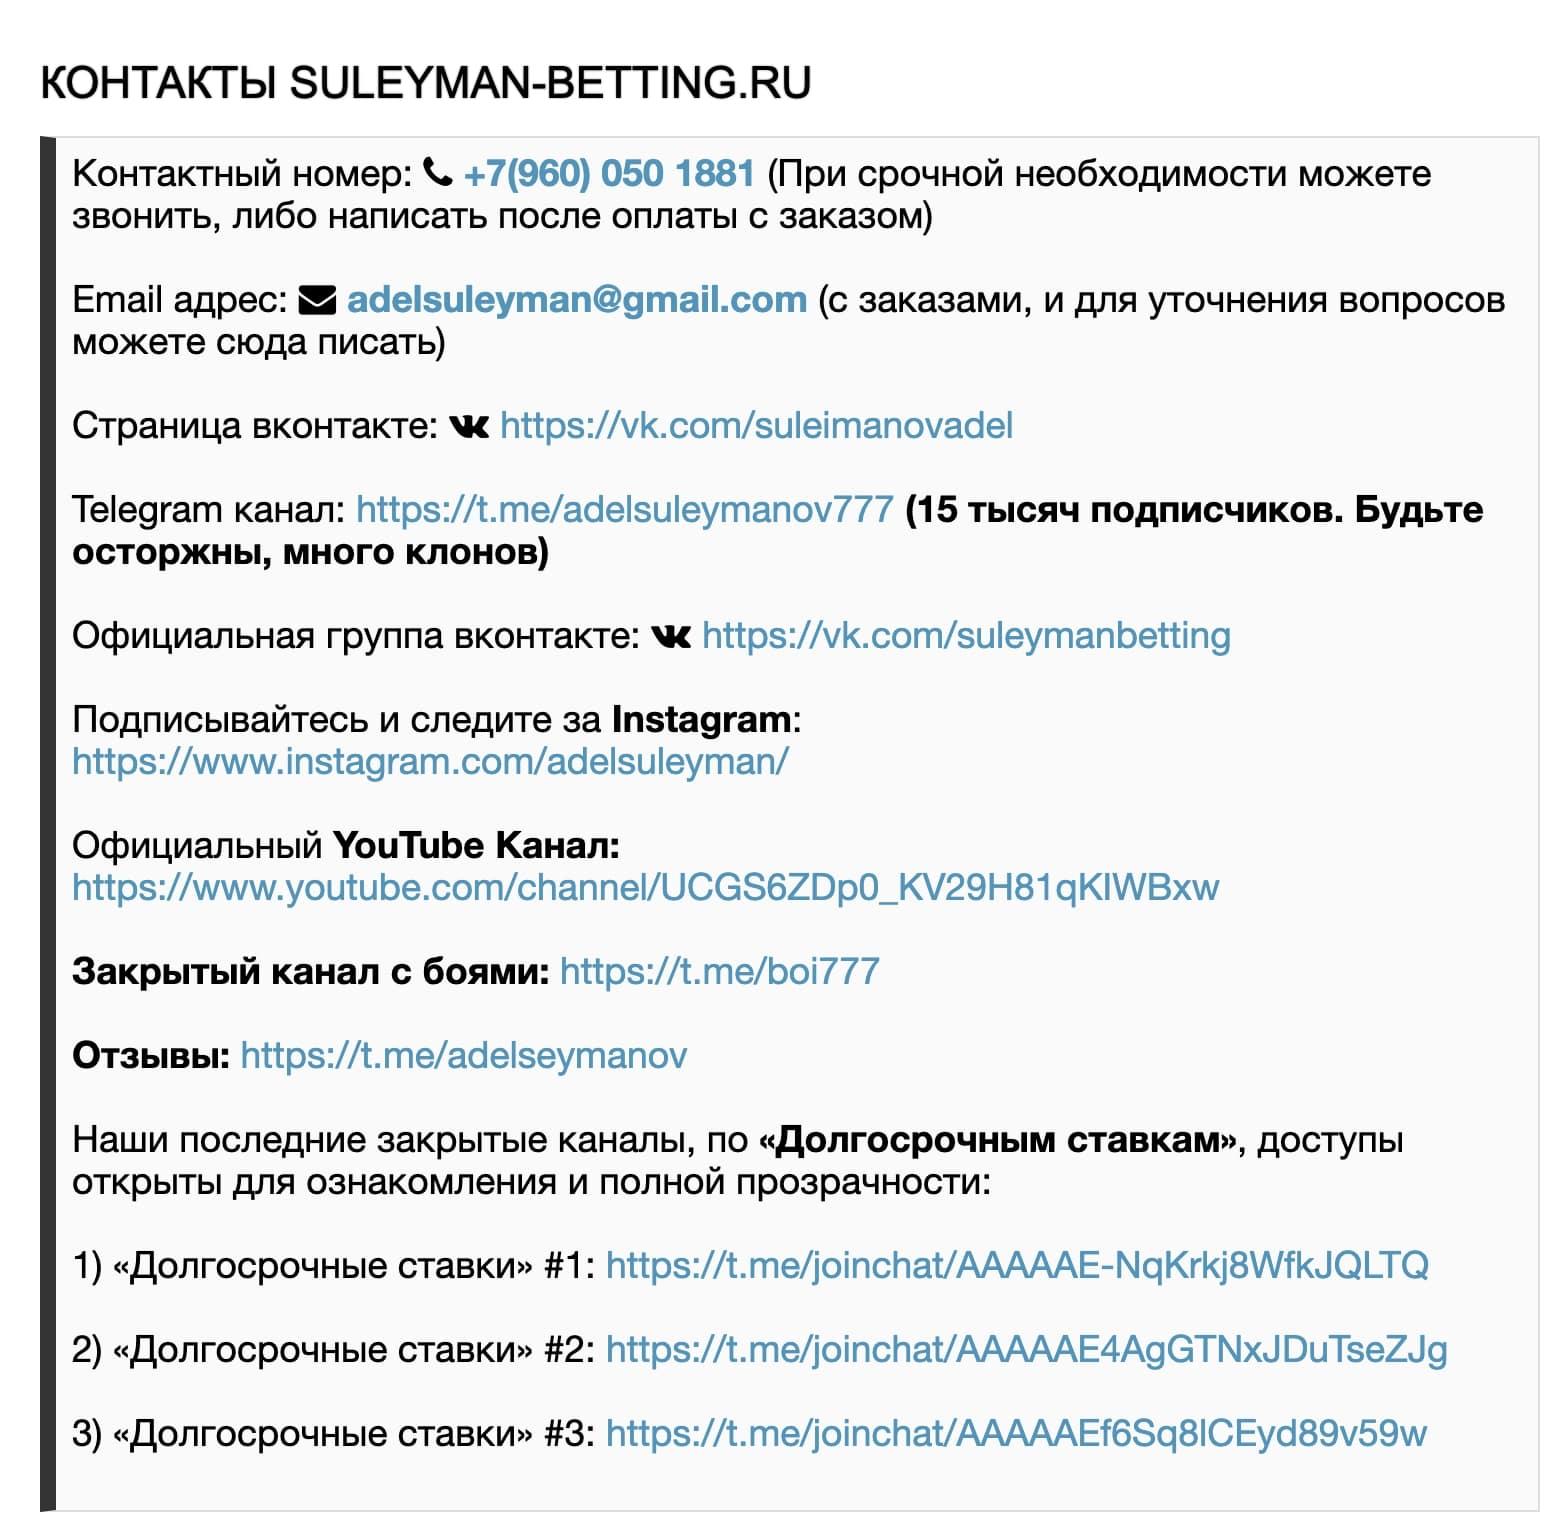 Контакты на сайте КАЦ Адель Сулейманов (Suleyman Betting ru)